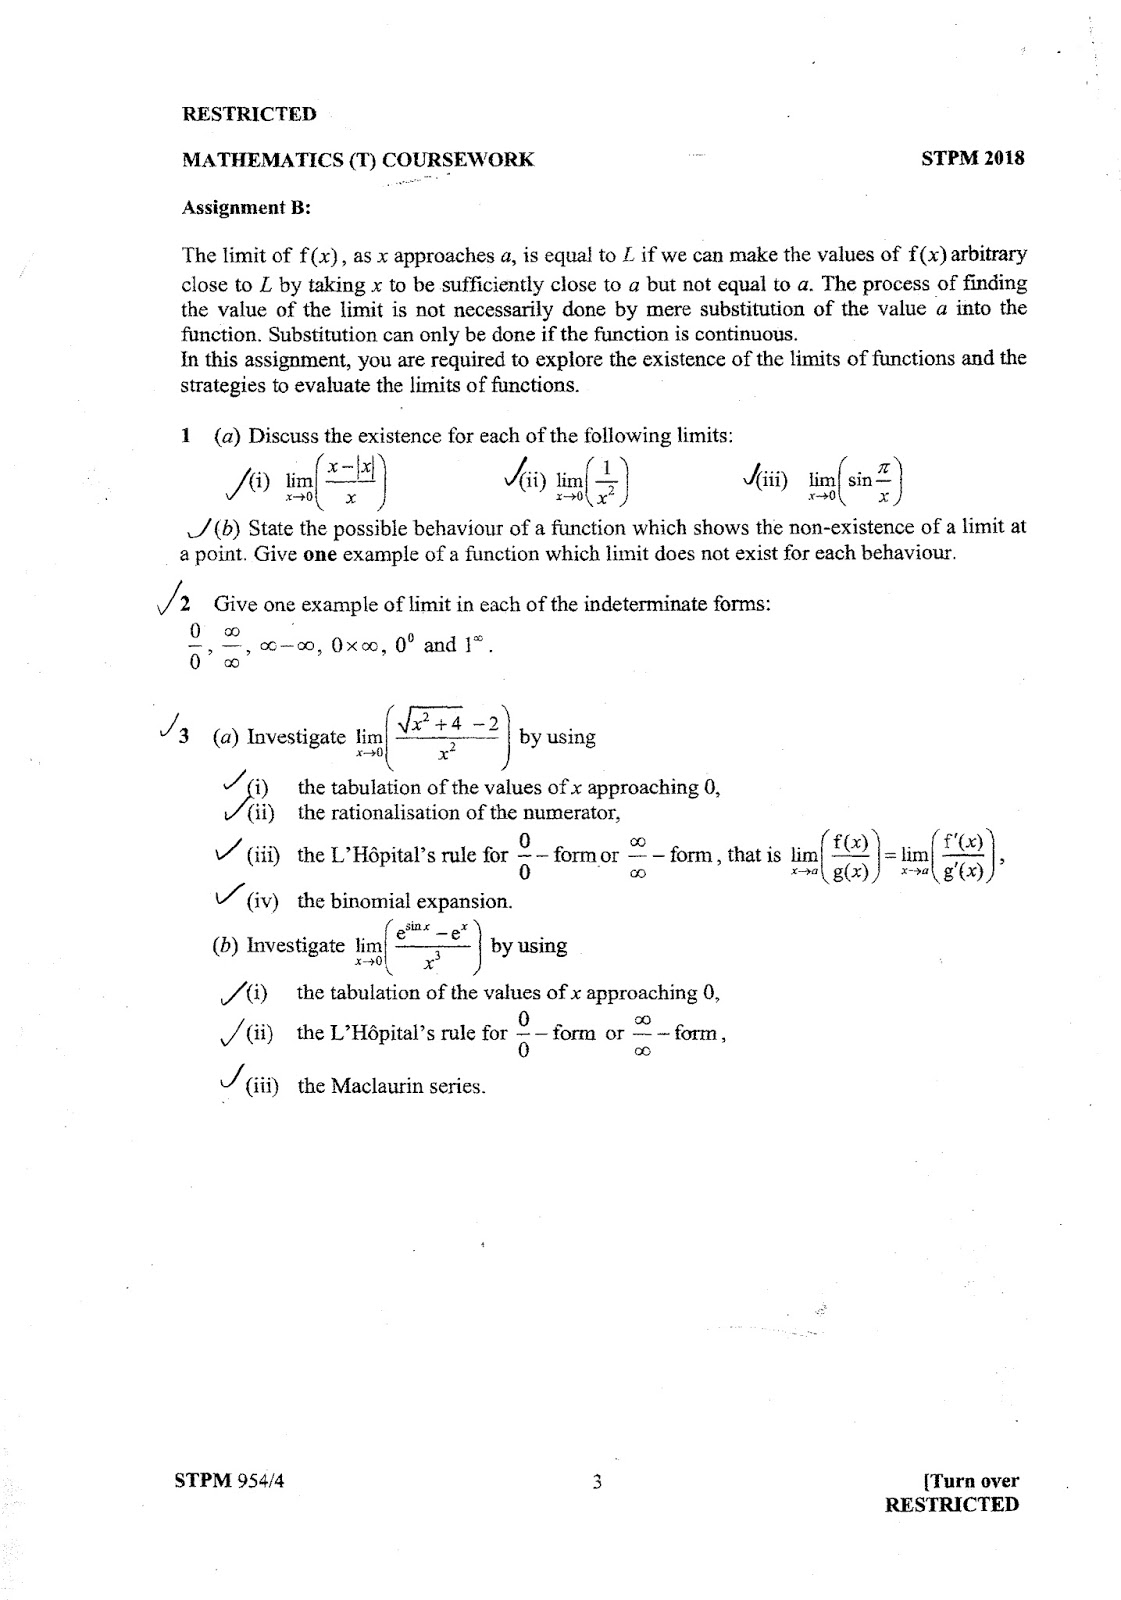 math t coursework stpm 2017 sem 2